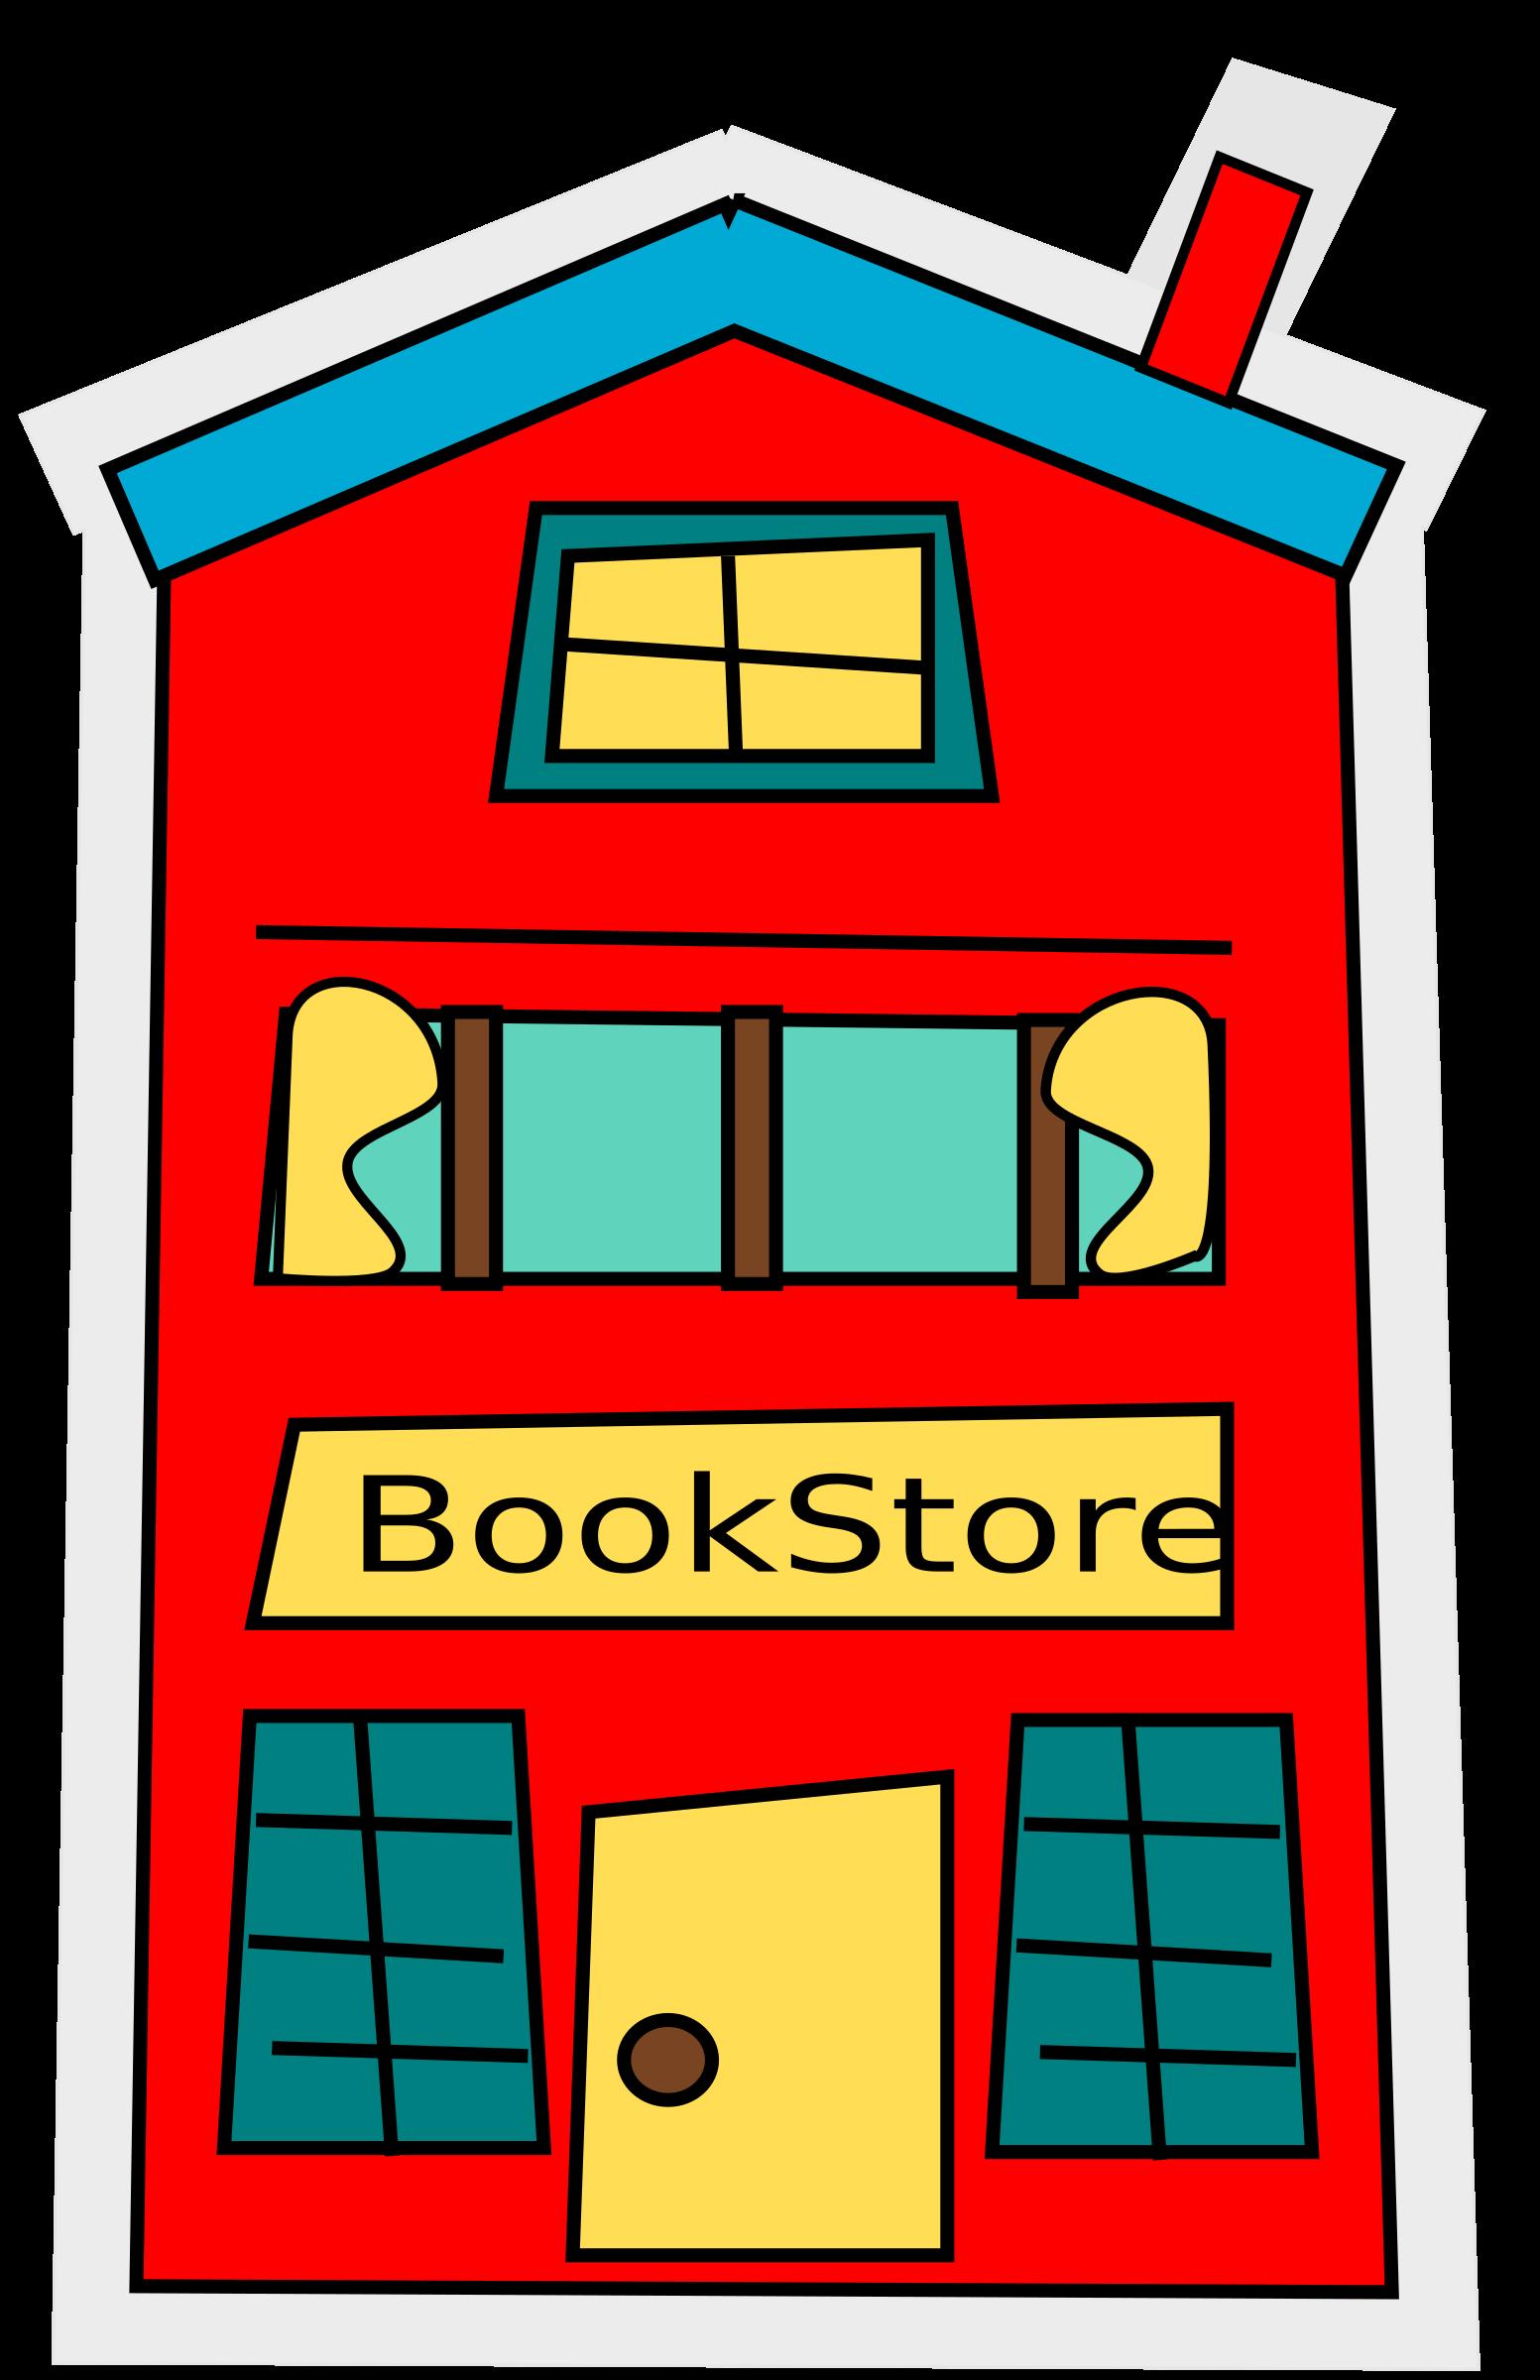 Bulding  clipart cartoon Clipart building bookstore cartoon cartoon